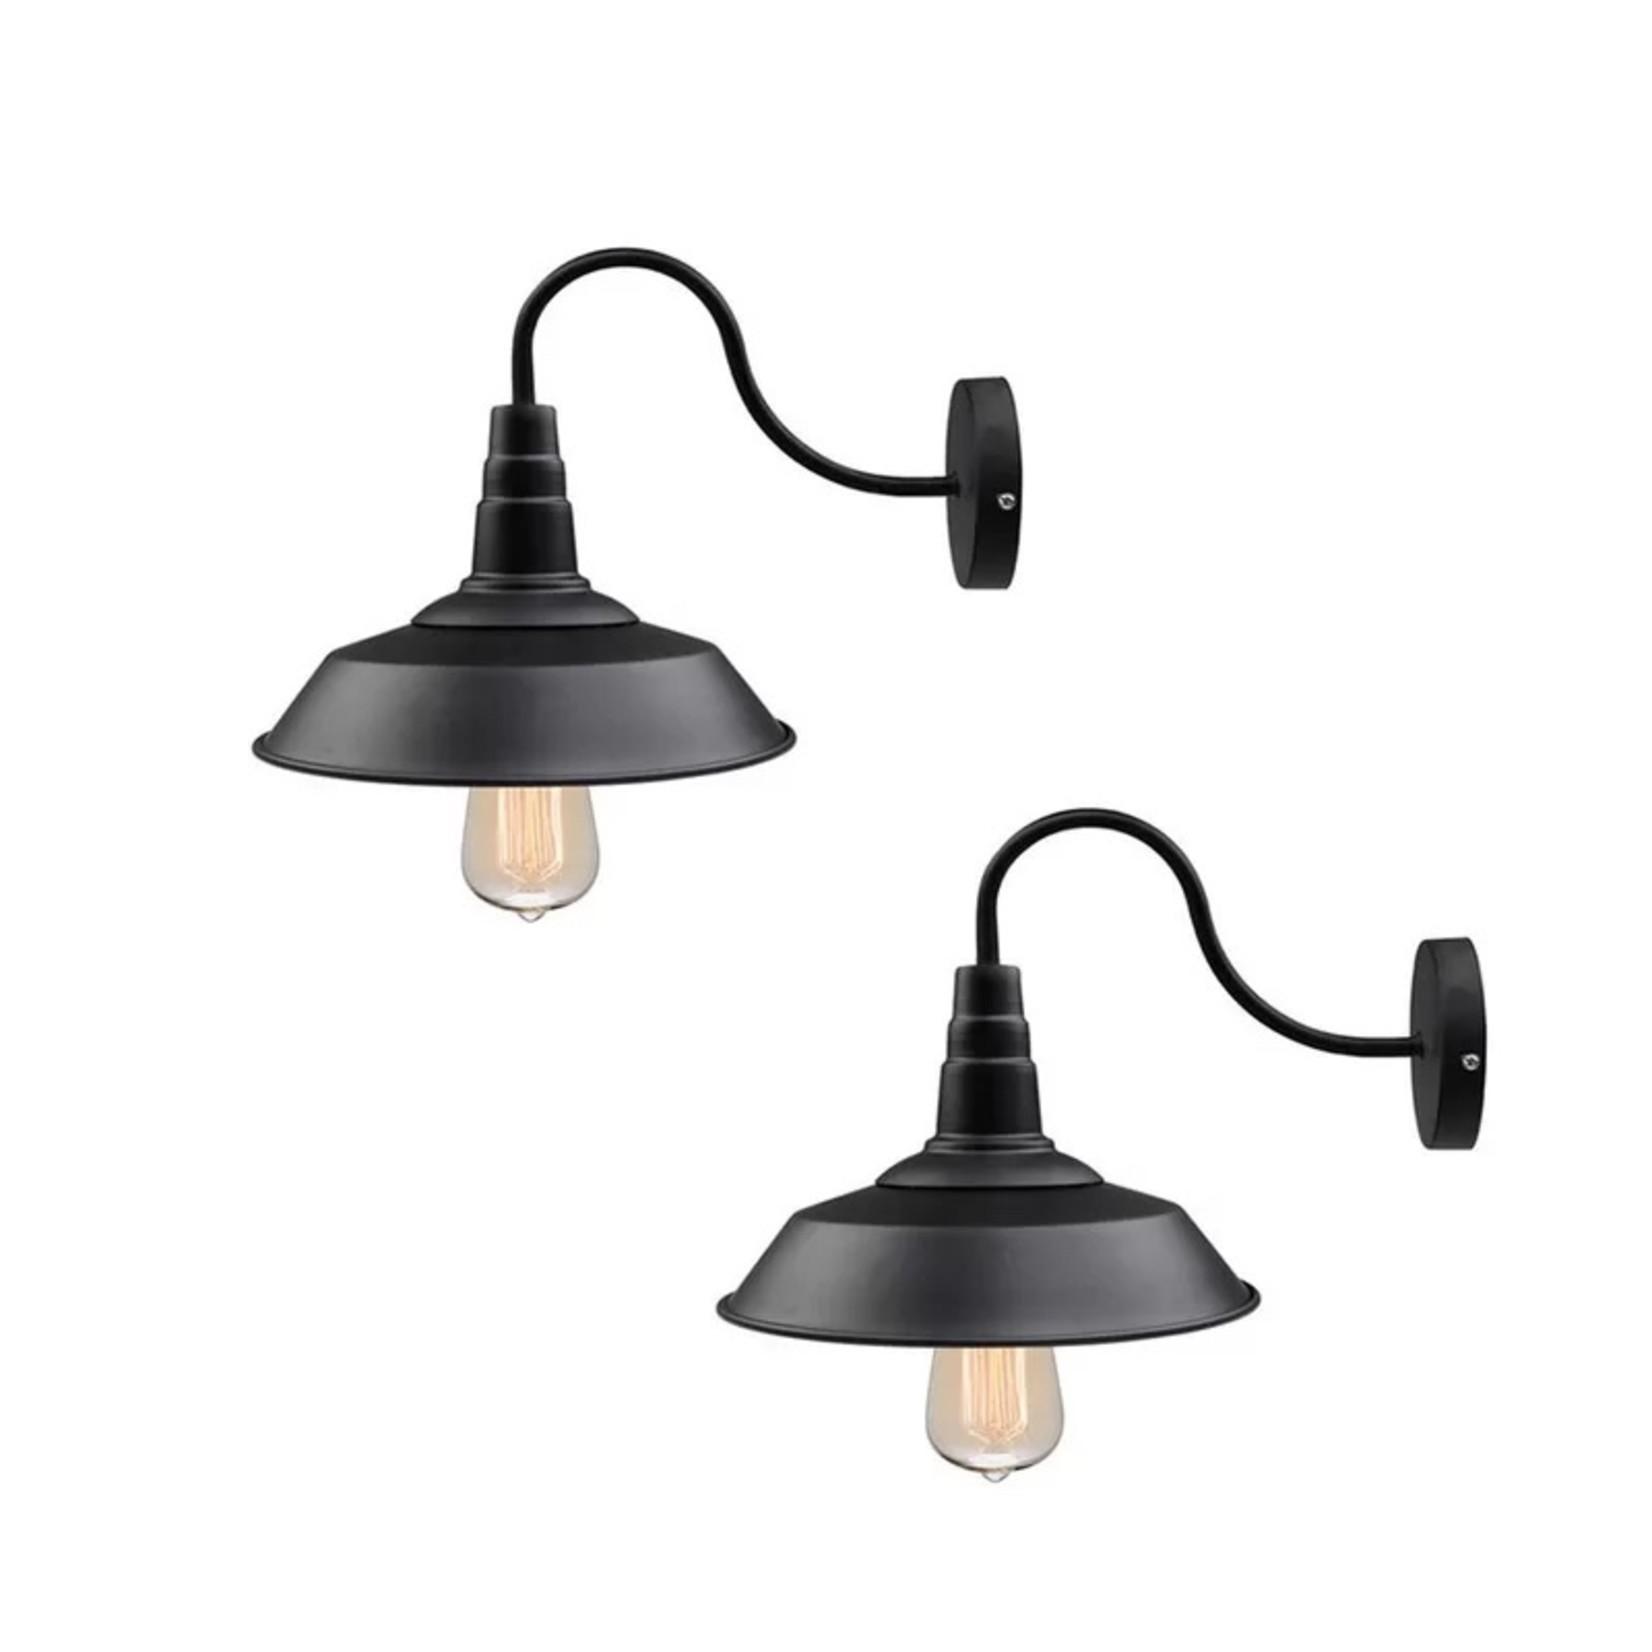 *Blountsville 2 - Light Black Barn Light - Set of 2